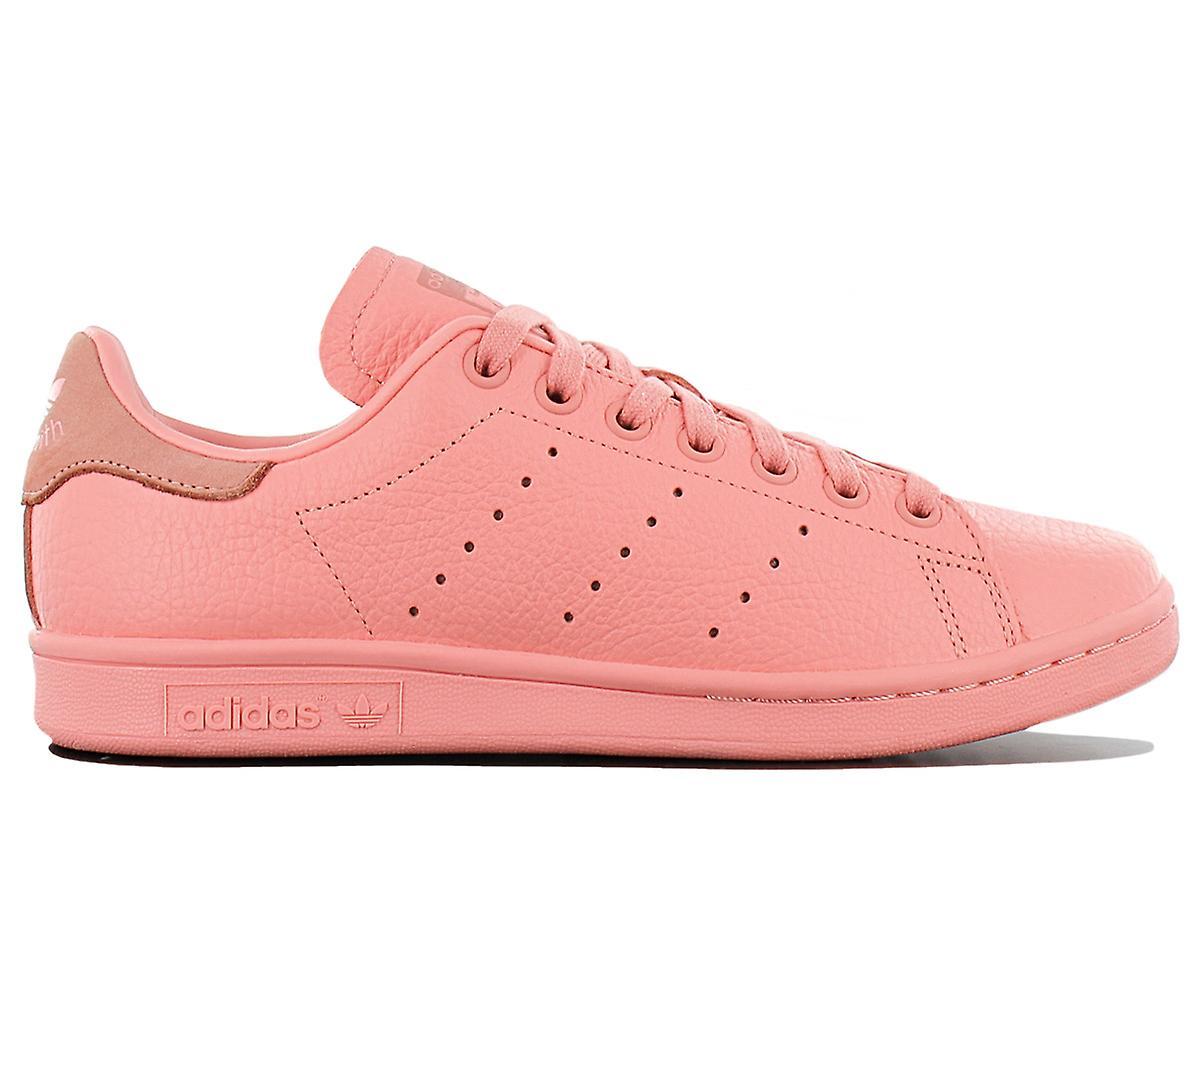 adidas Stan Smith BZ0469 Damen Schuhe Rosa Sneakers Sportschuhe T9GEH